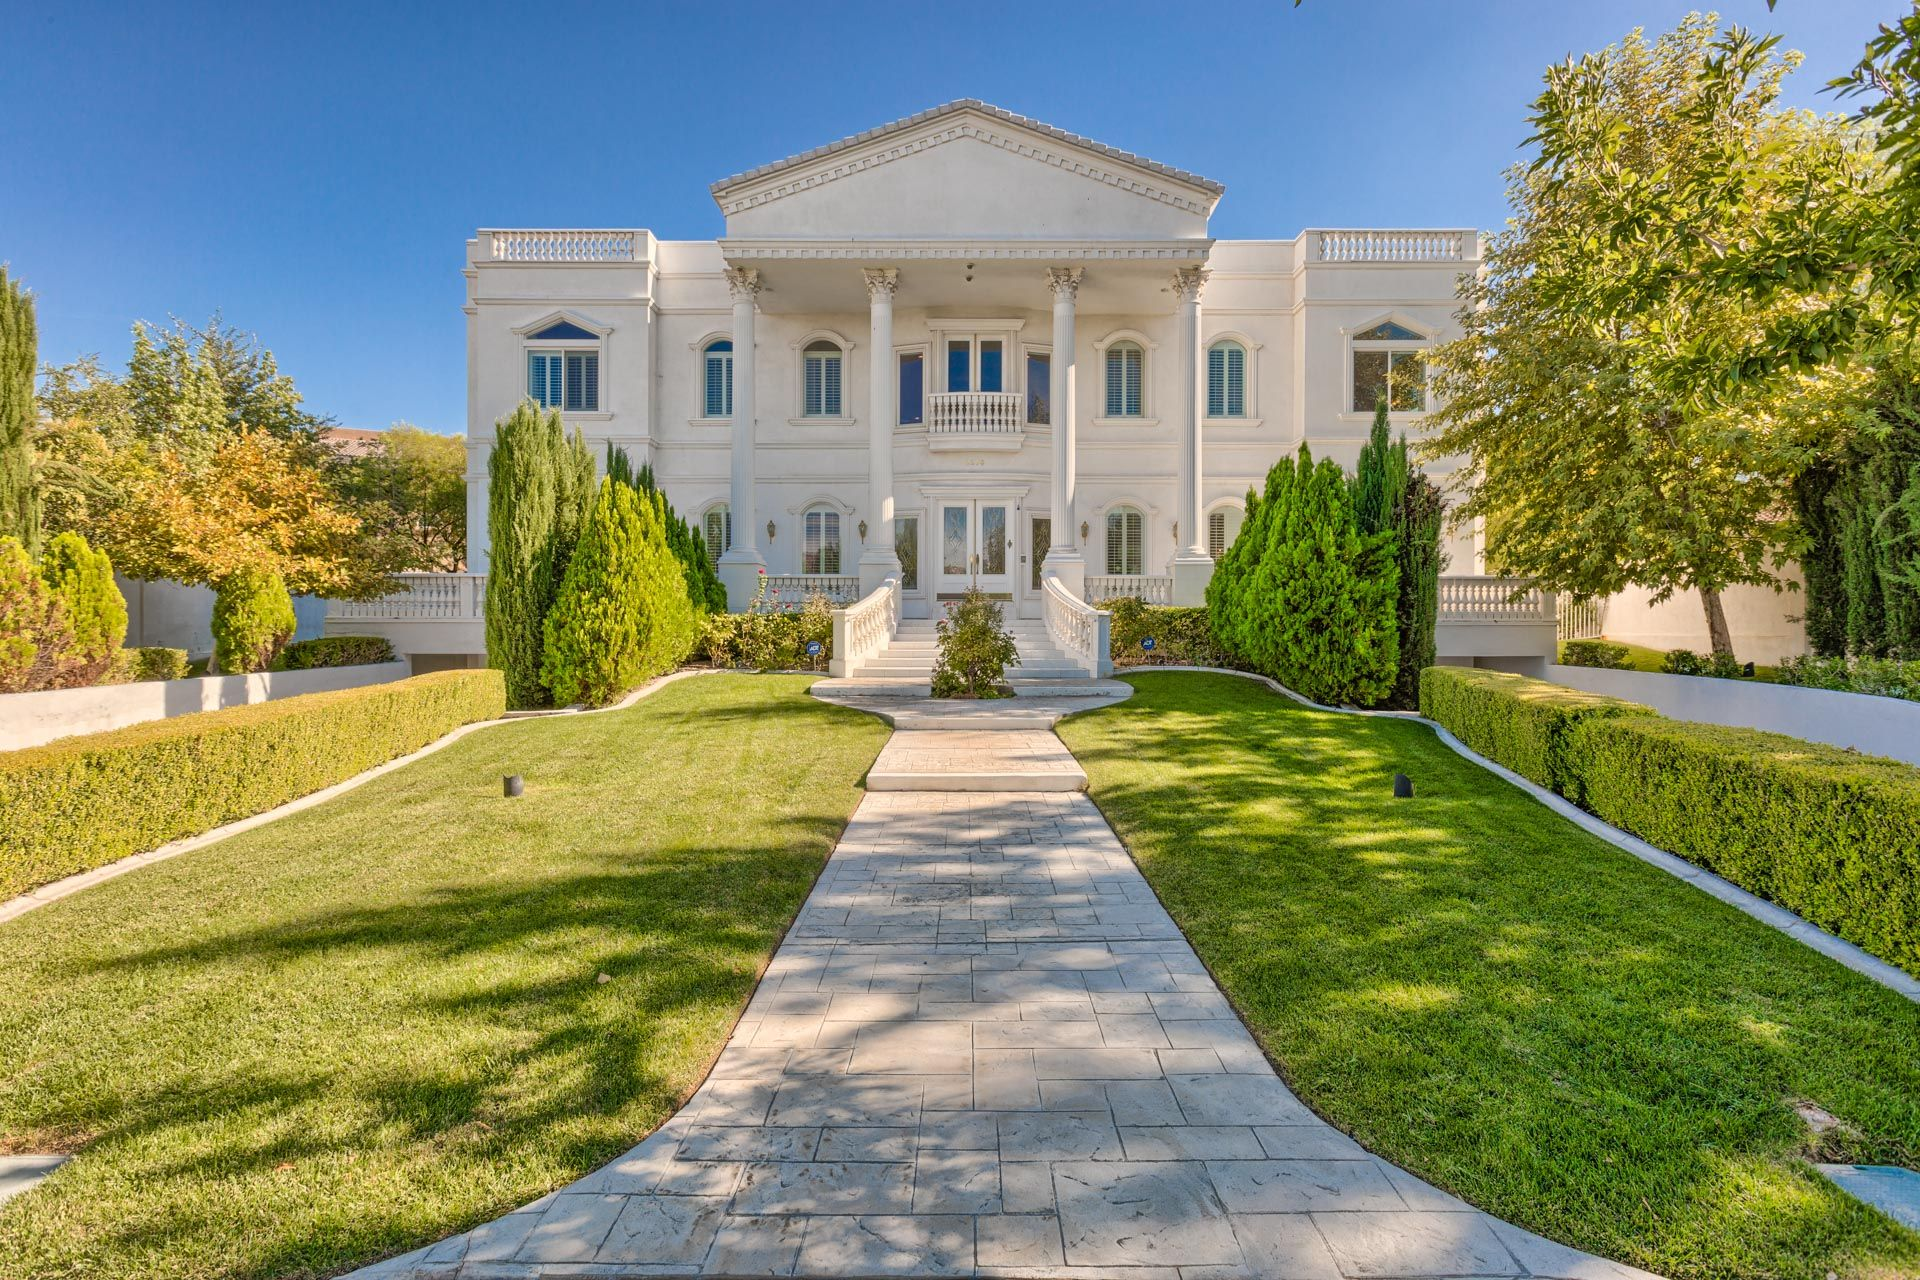 Million Dollar Homes In Las Vegas For Sale 1m 3m Million Dollar Homes Luxury Homes Dream Houses Cottage Homes